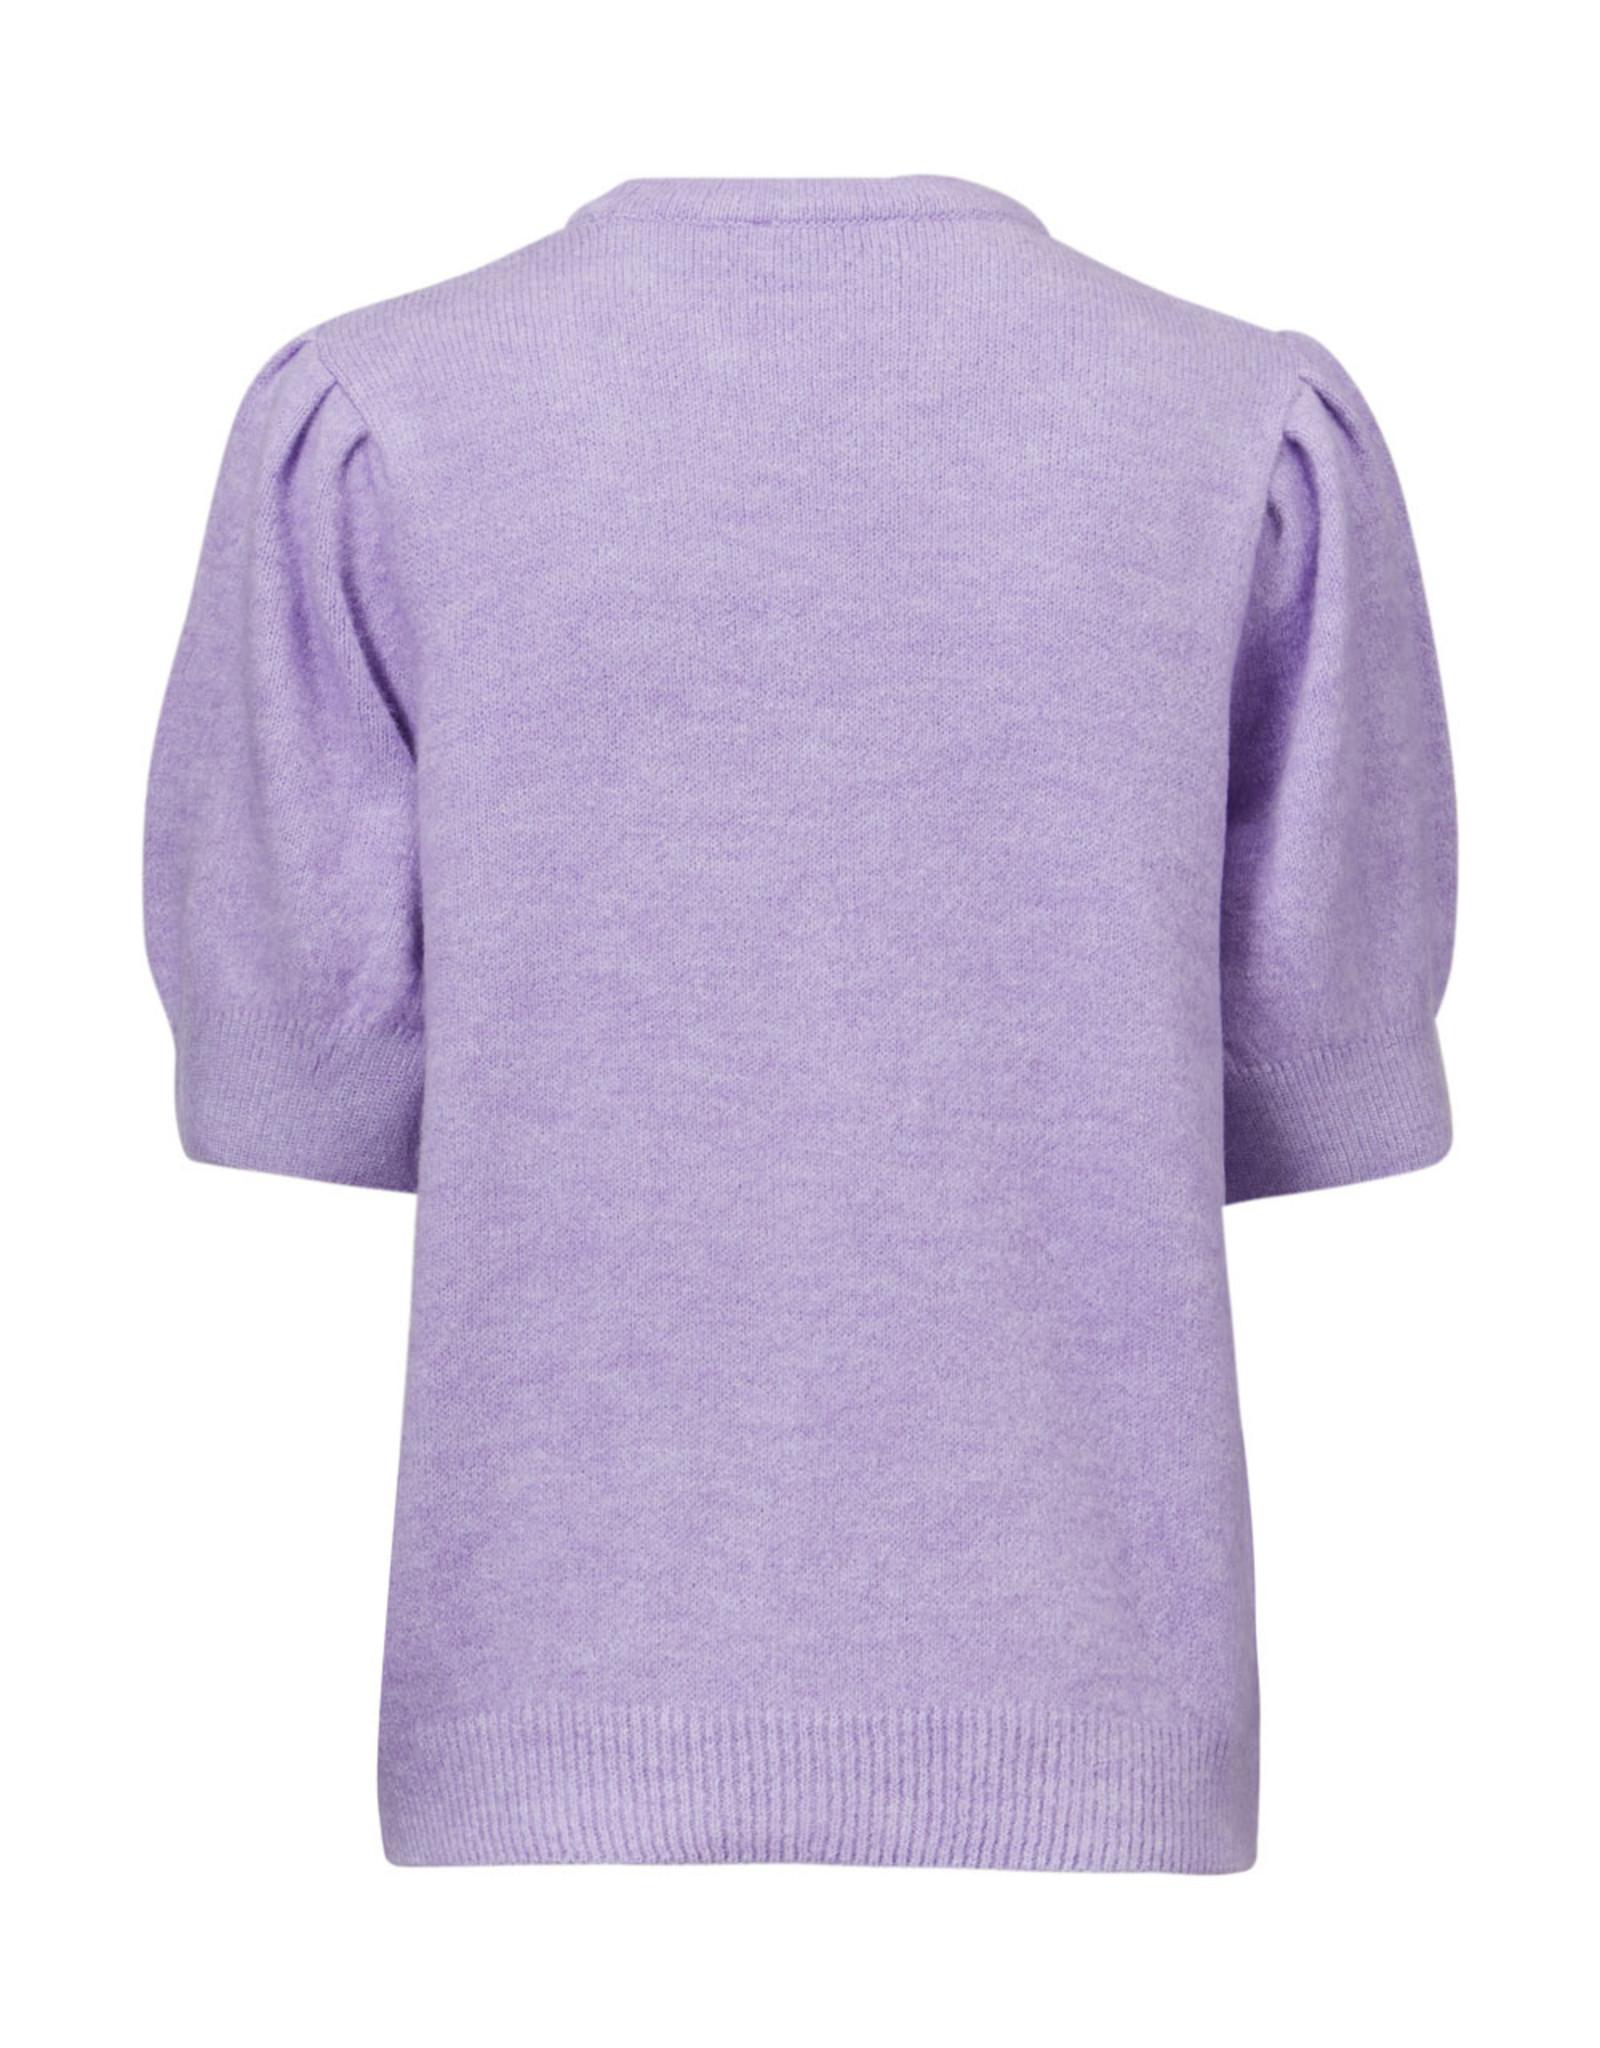 Modstrom Juliane O-Neck Knit Sweater Lavender